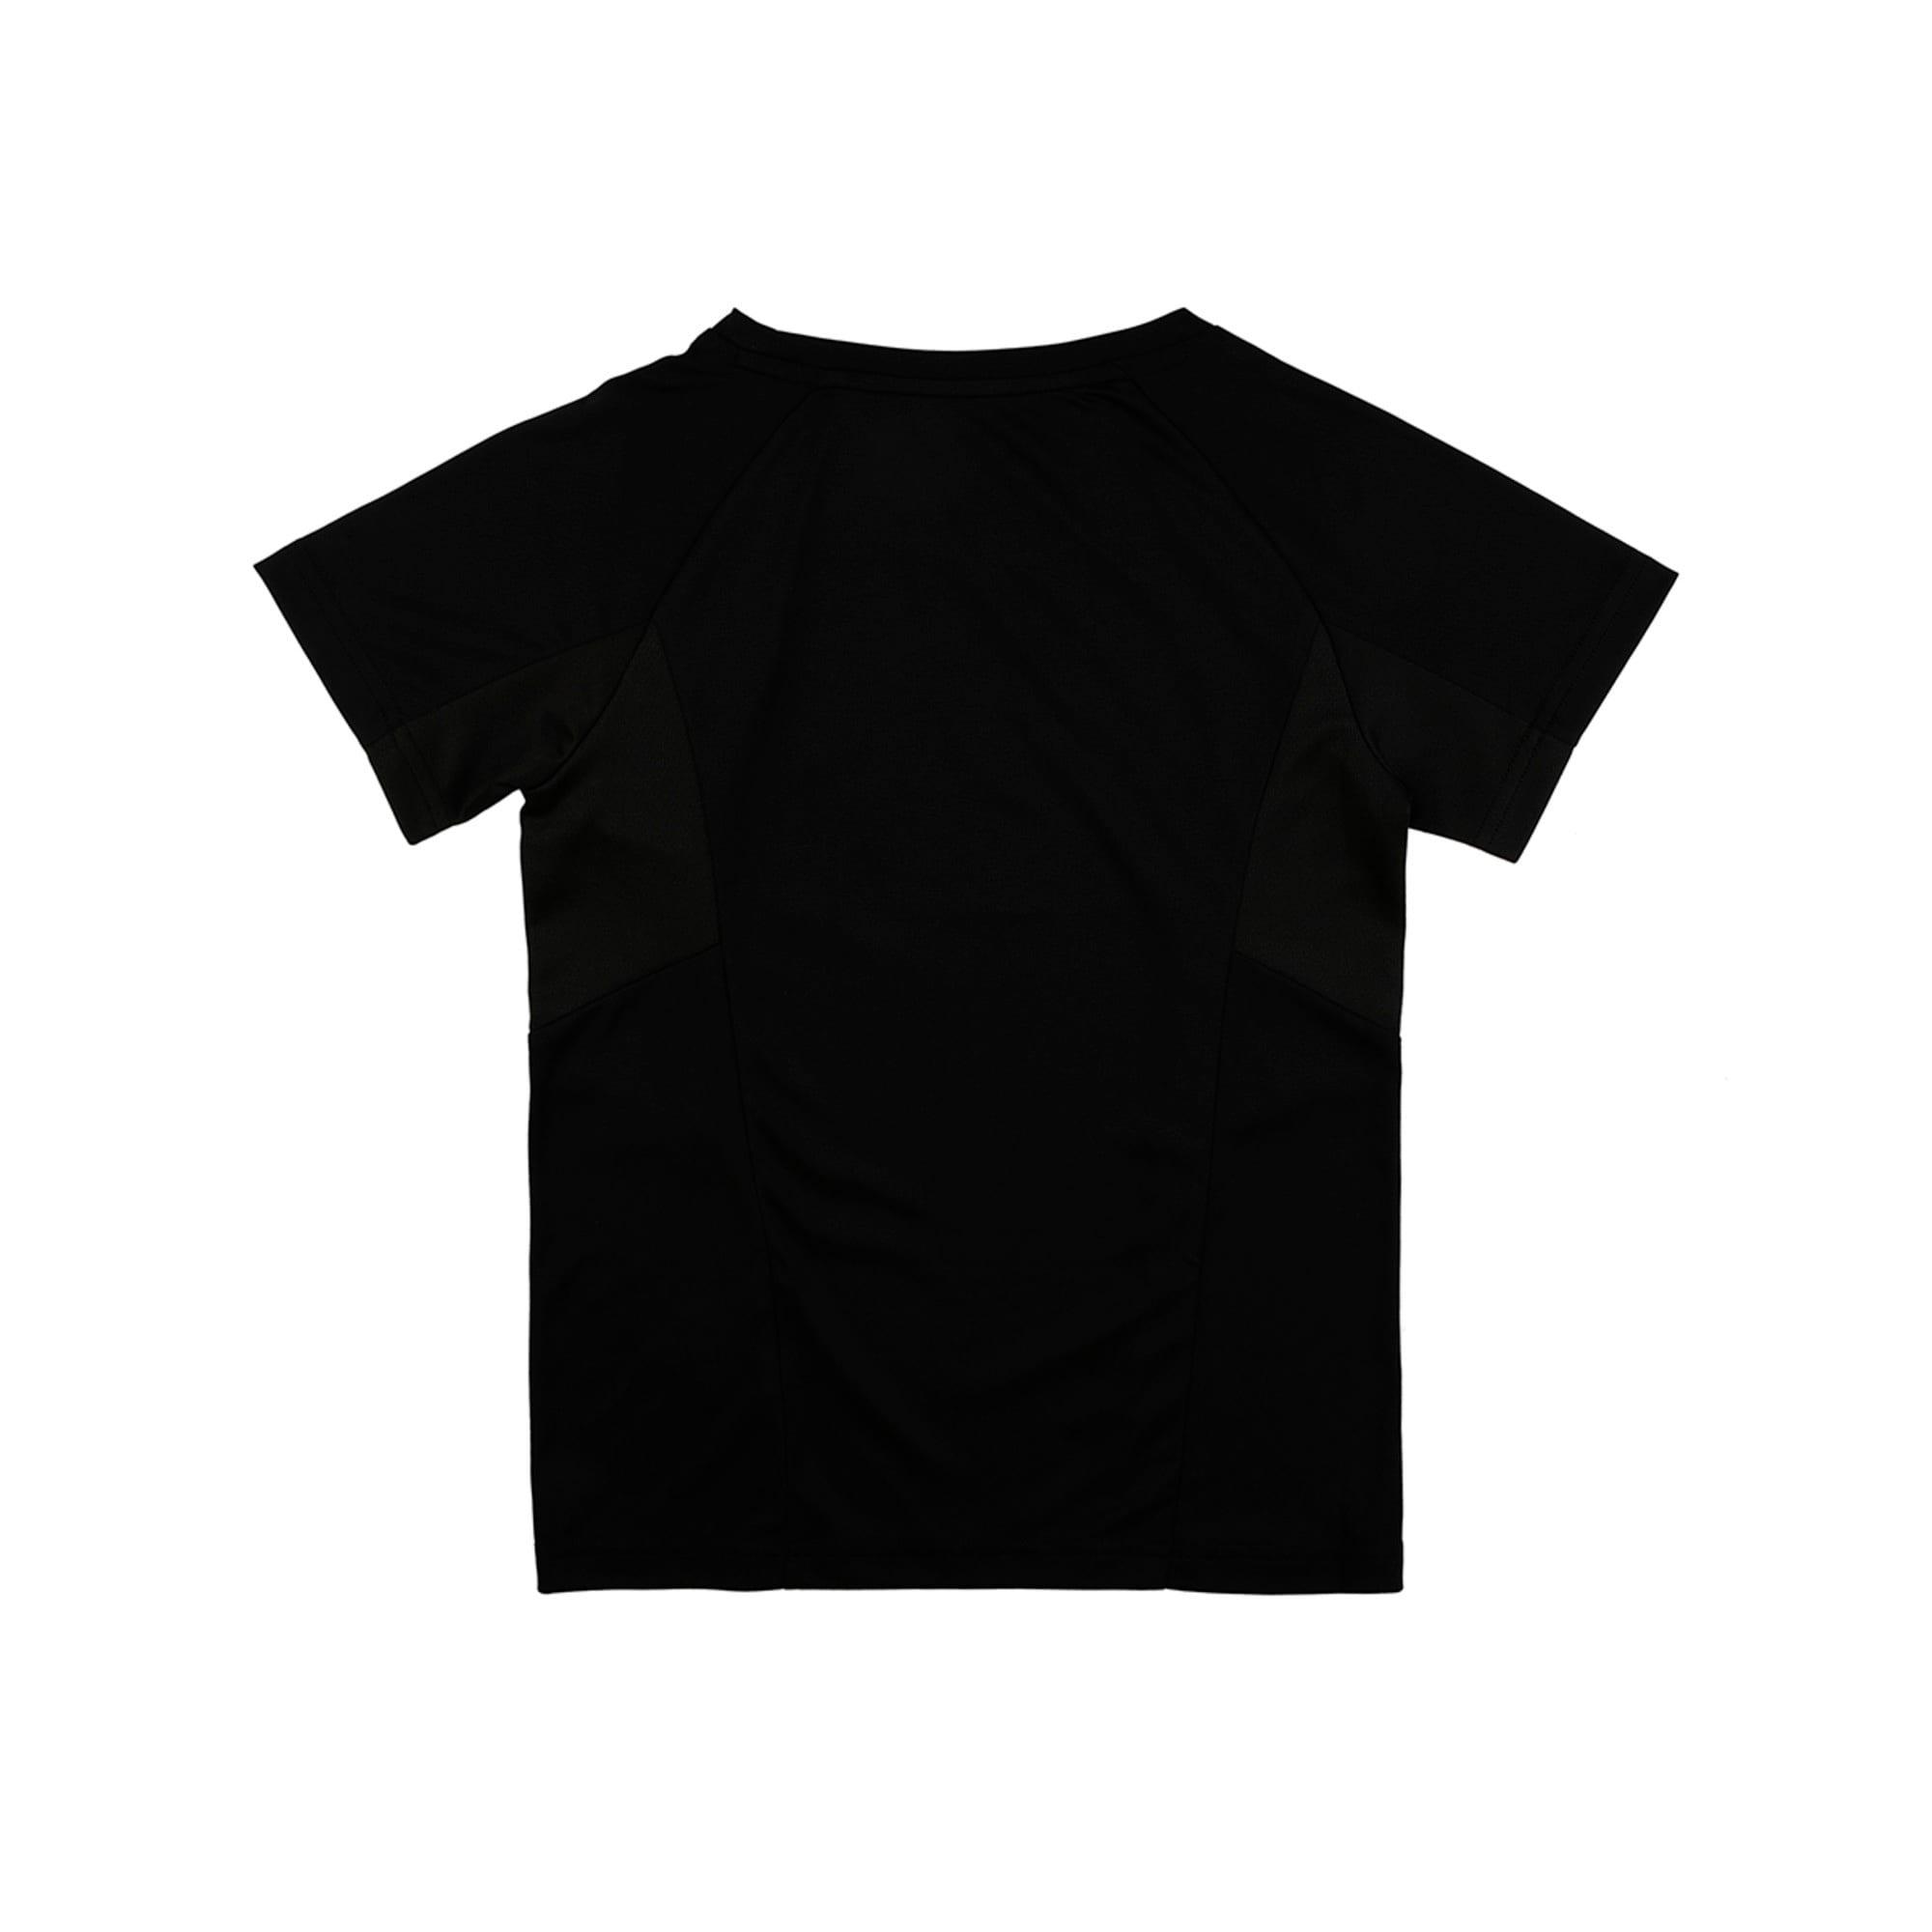 Thumbnail 2 of Active Sports Short Sleeve Boys' Tee, Puma Black, medium-IND